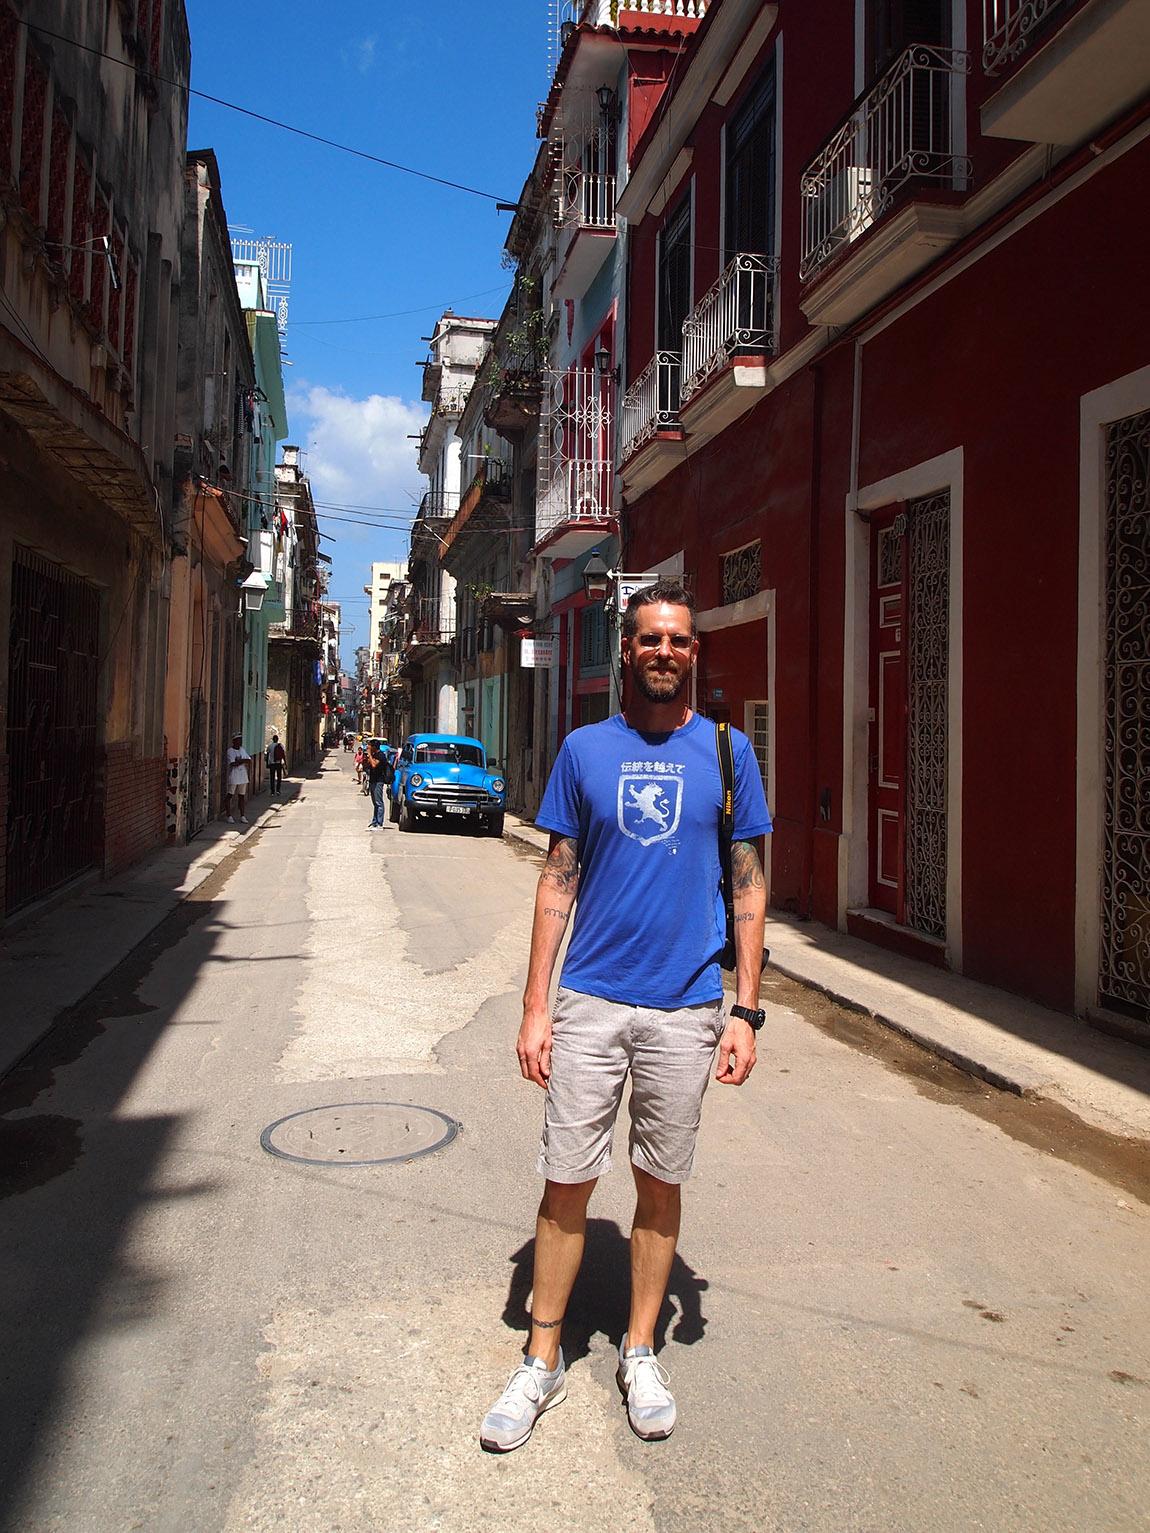 Cuba-Havana-Old-Street-B